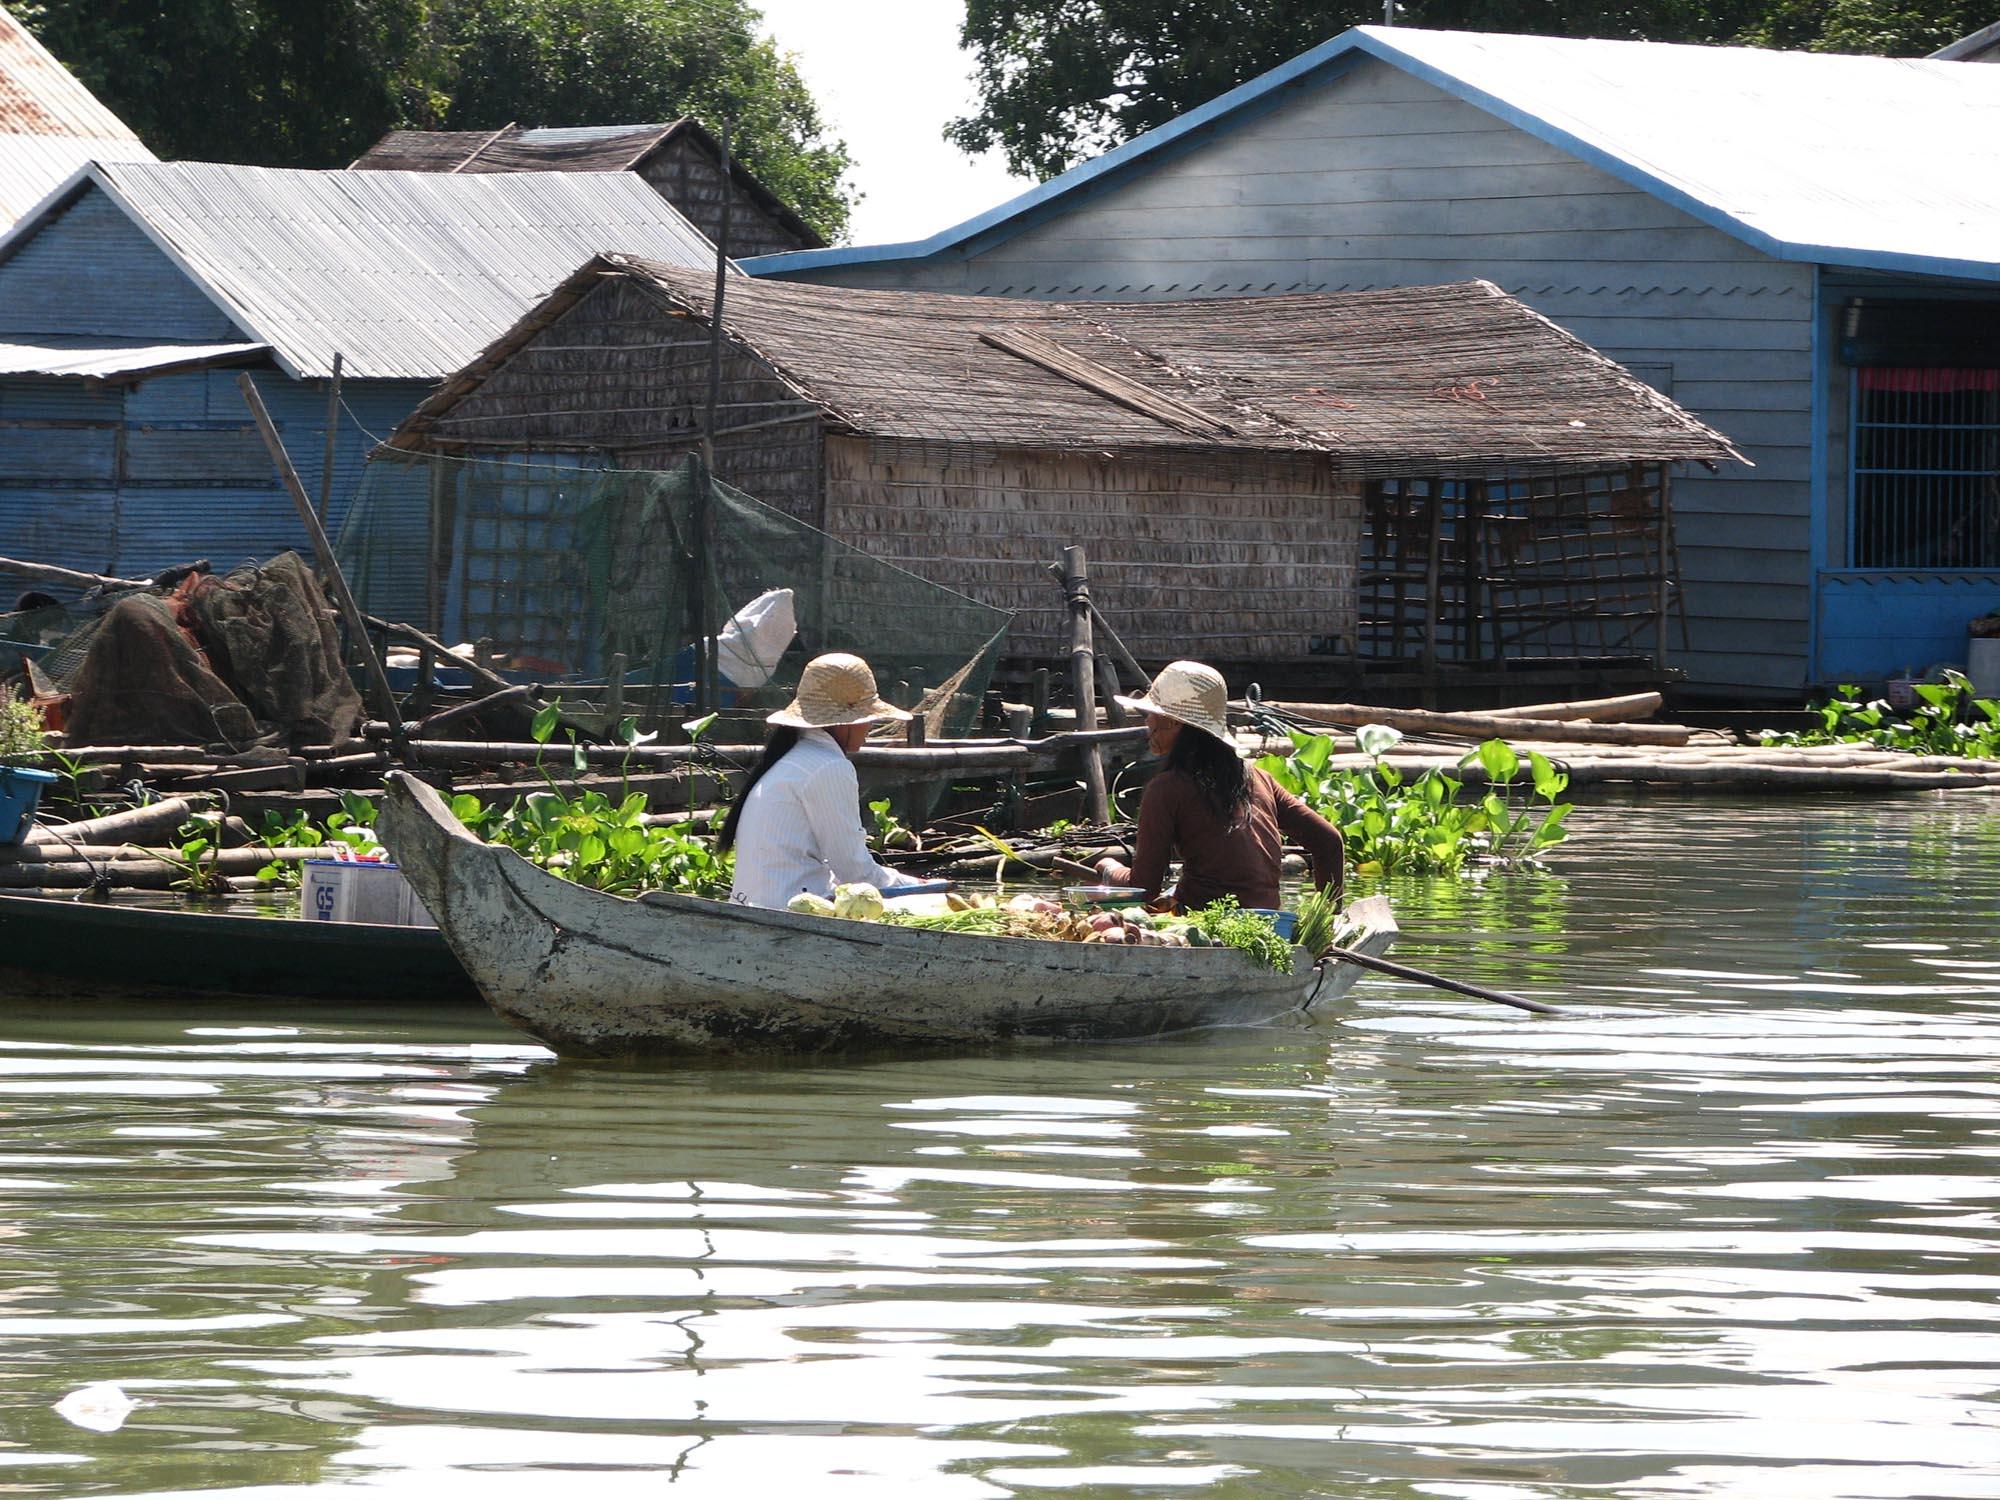 Women in boat with vegetables, Prek Toal